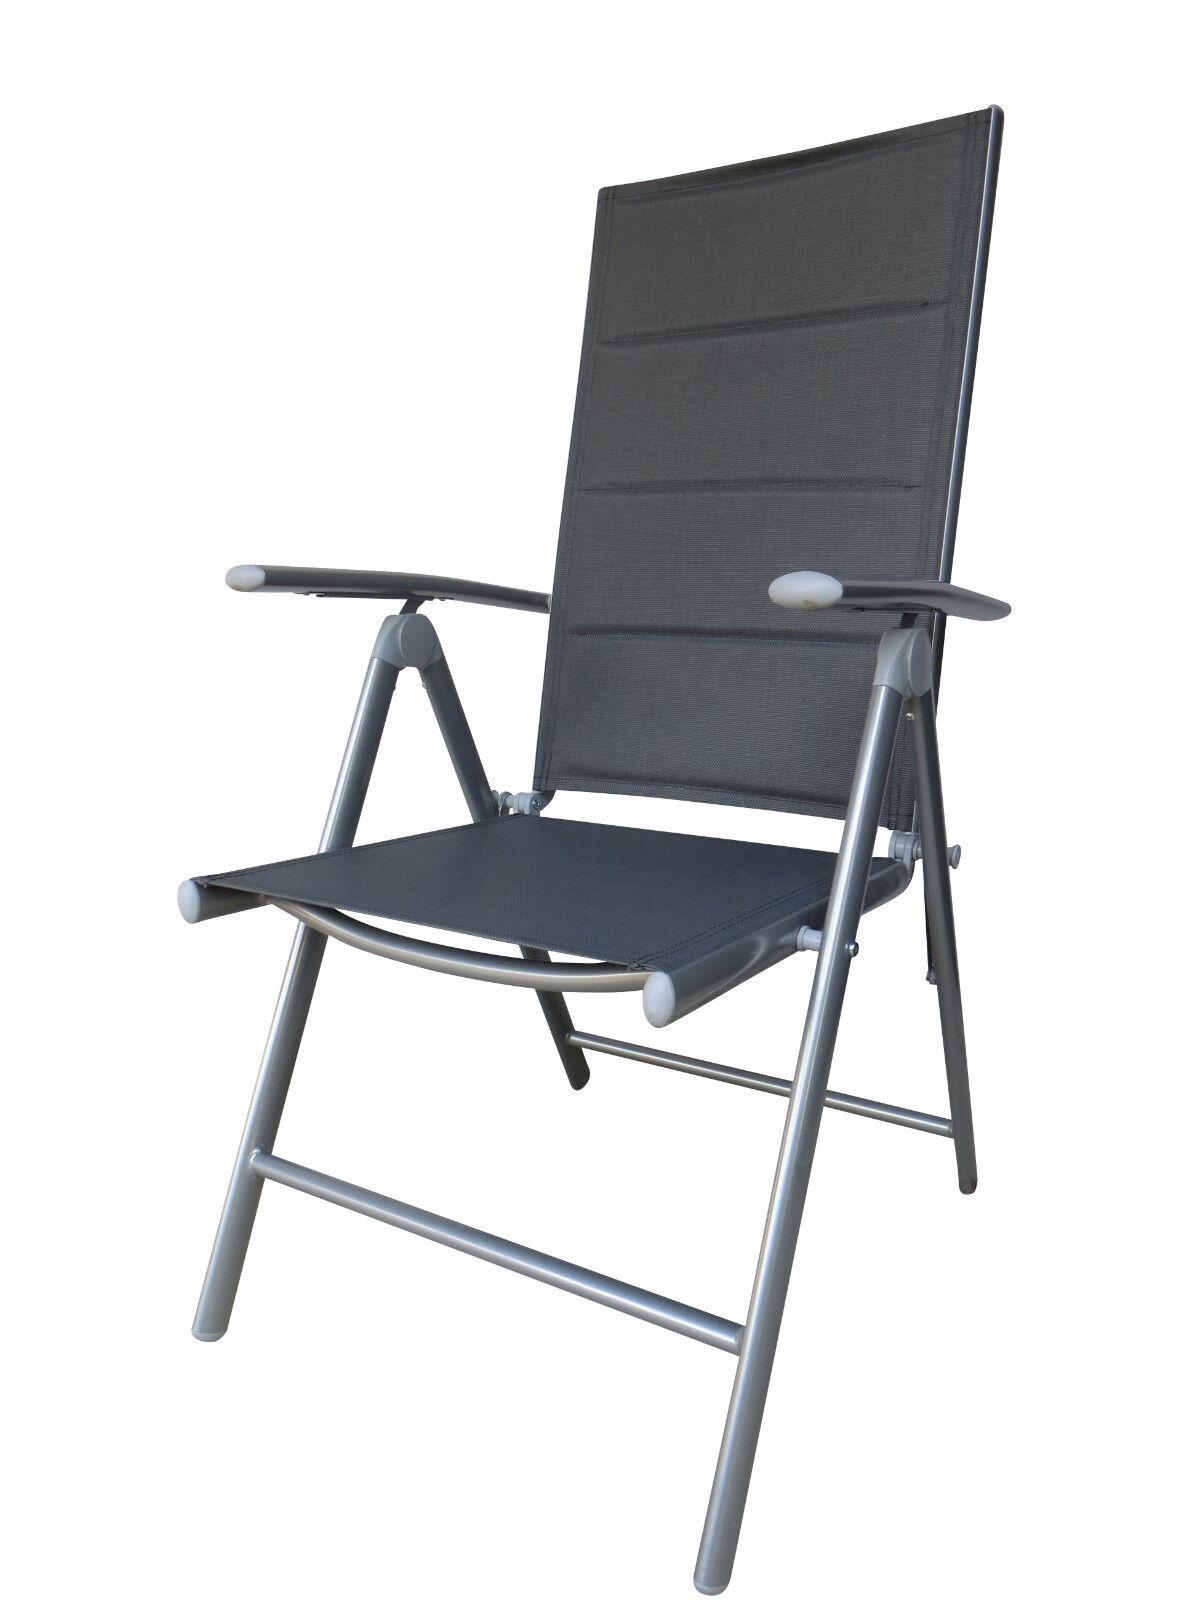 Mandalika plegable sillón bolero silb. Padded Alu silla plegable muebles de jardín silla de jardín